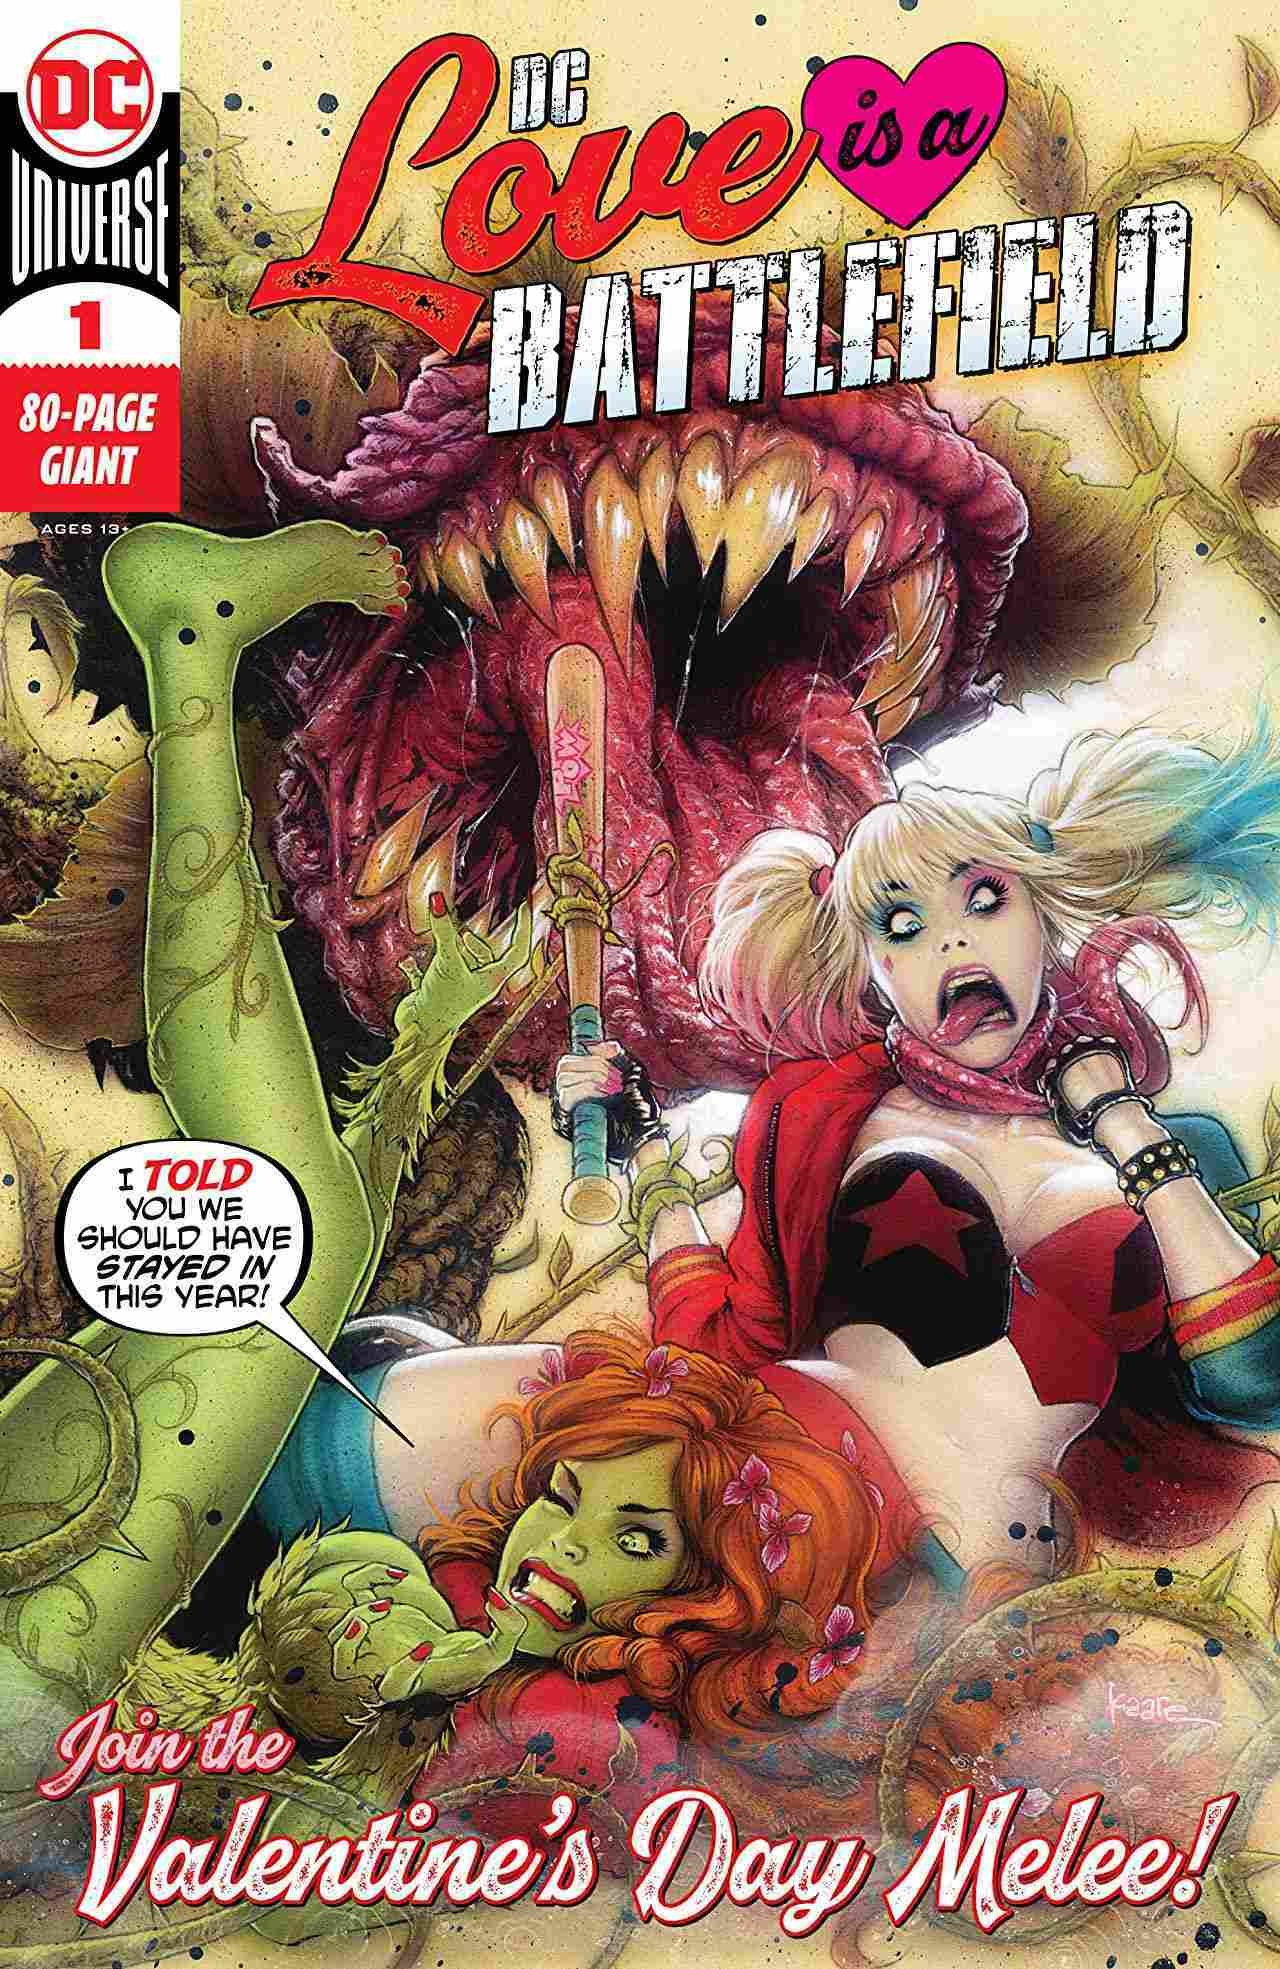 DC Love Is a Battlefield #1